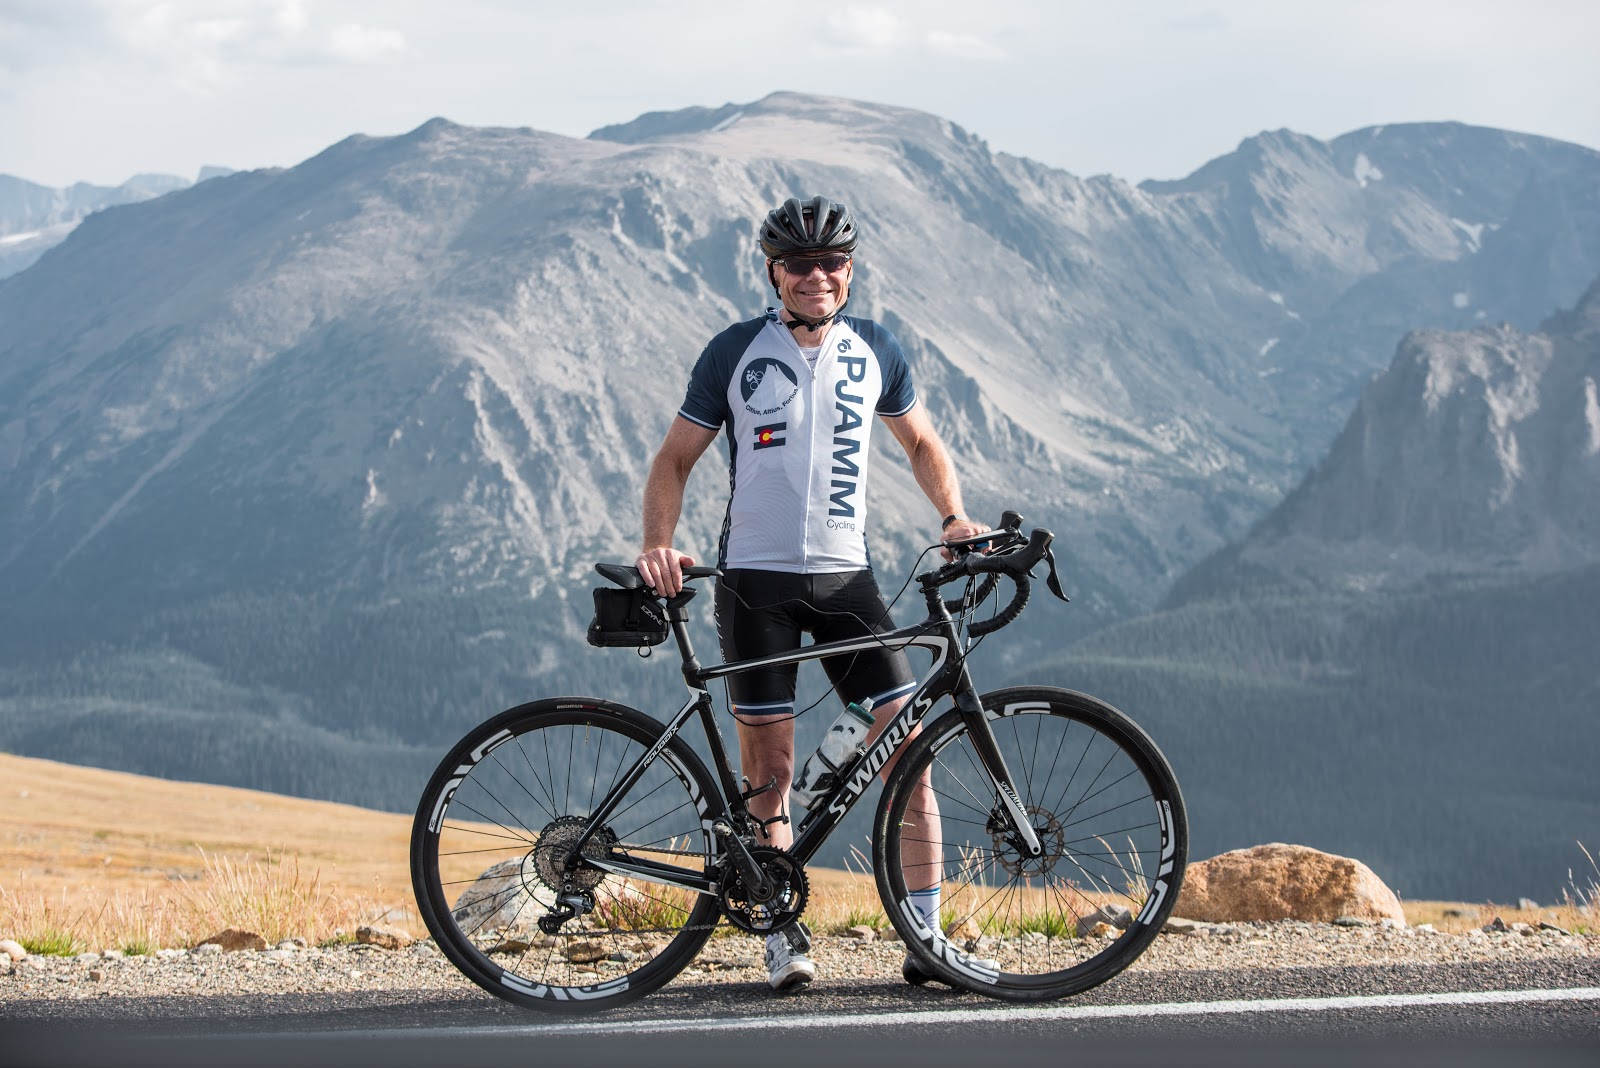 John Johnson PJAMM Cycling with bike at high point of Trail Ridge bike climb